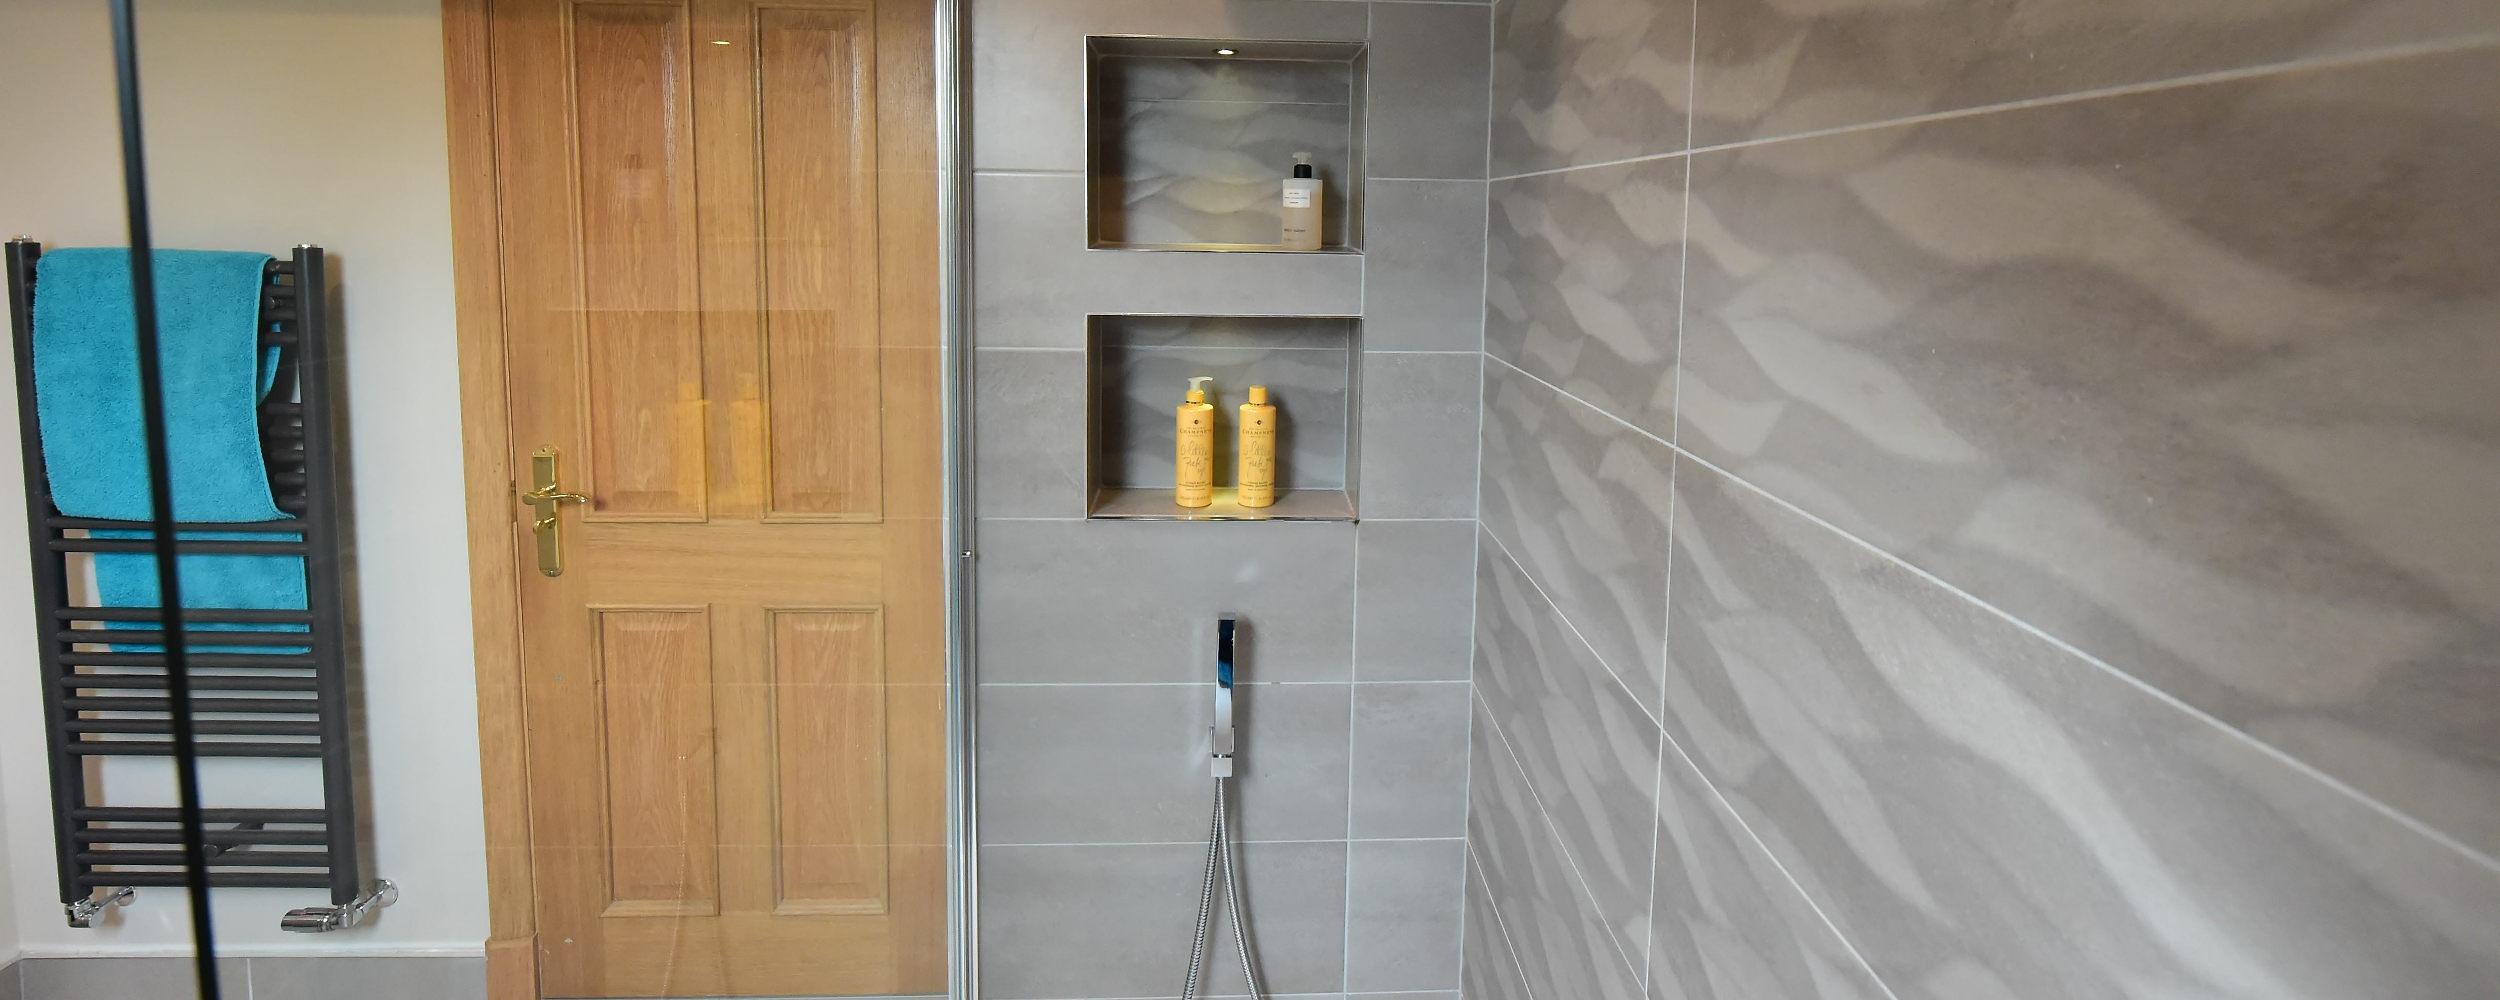 showers from EKCO edinburgh